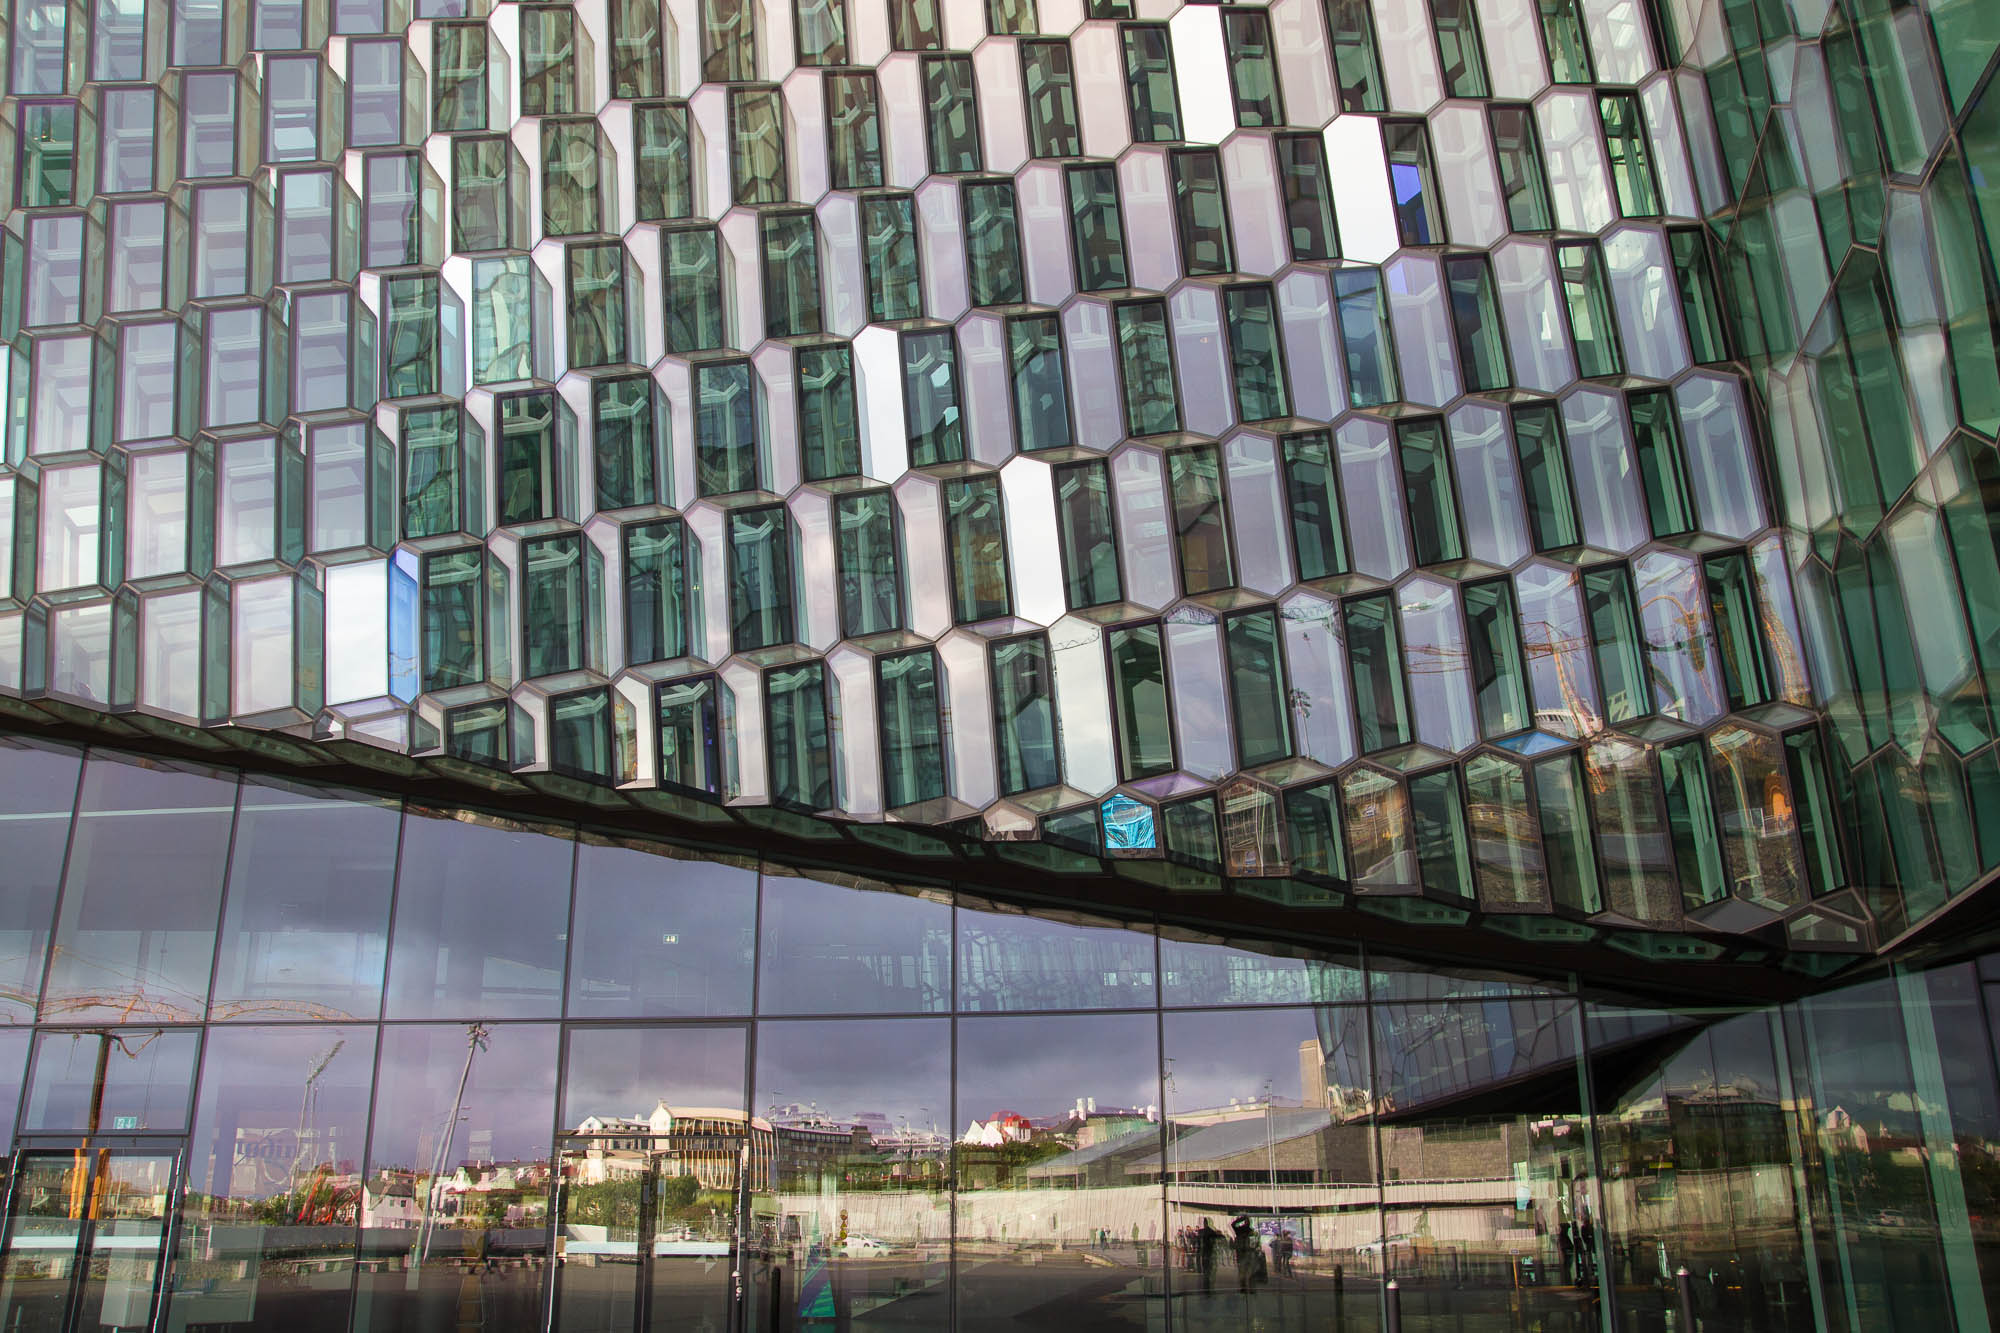 Façade, Harpa, Reykjavik (1)